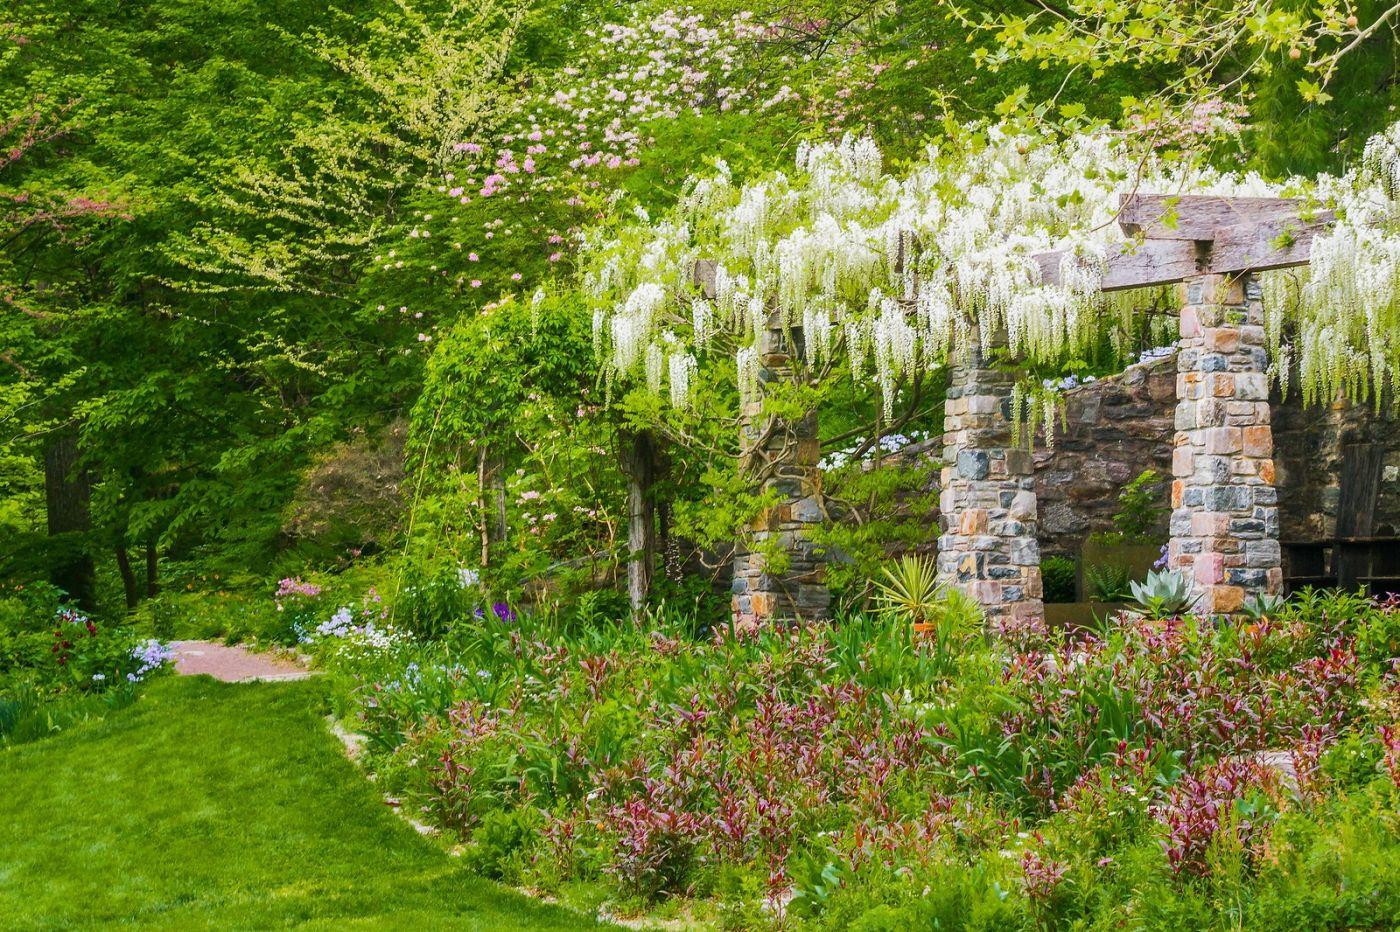 Chanticleer花园,那年盛开的紫藤花_图1-15